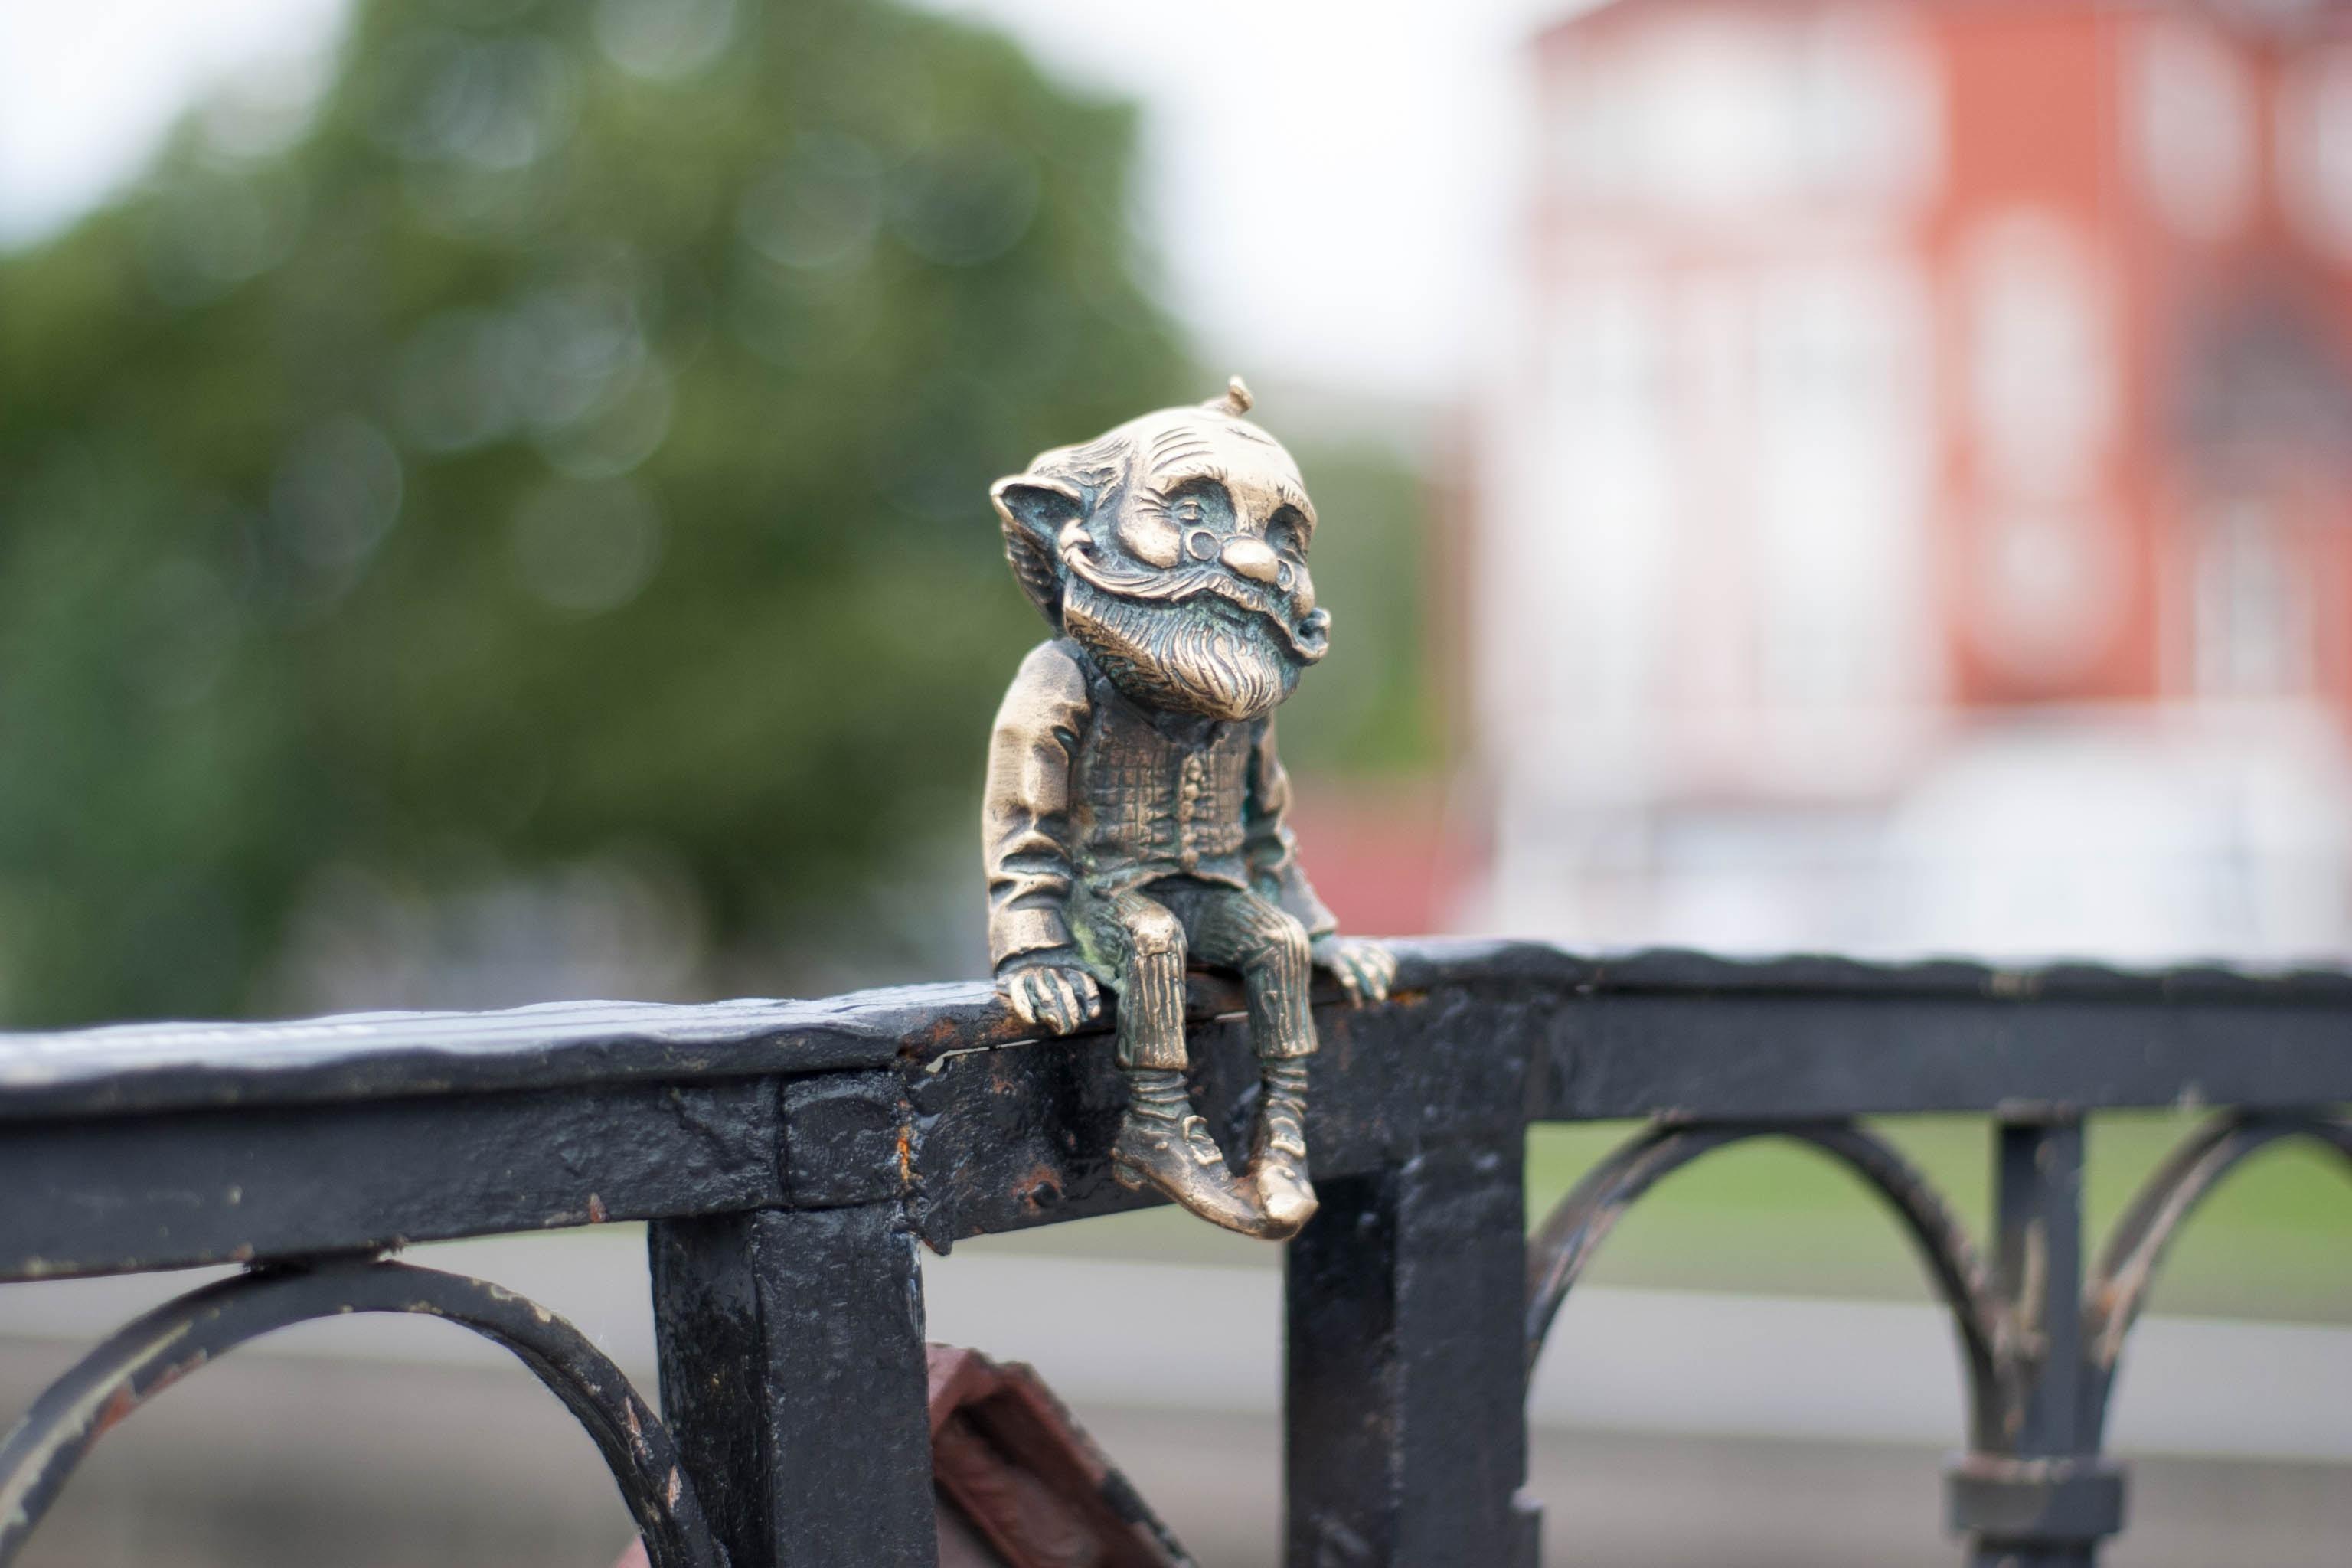 man figurine on grey wooden handrail